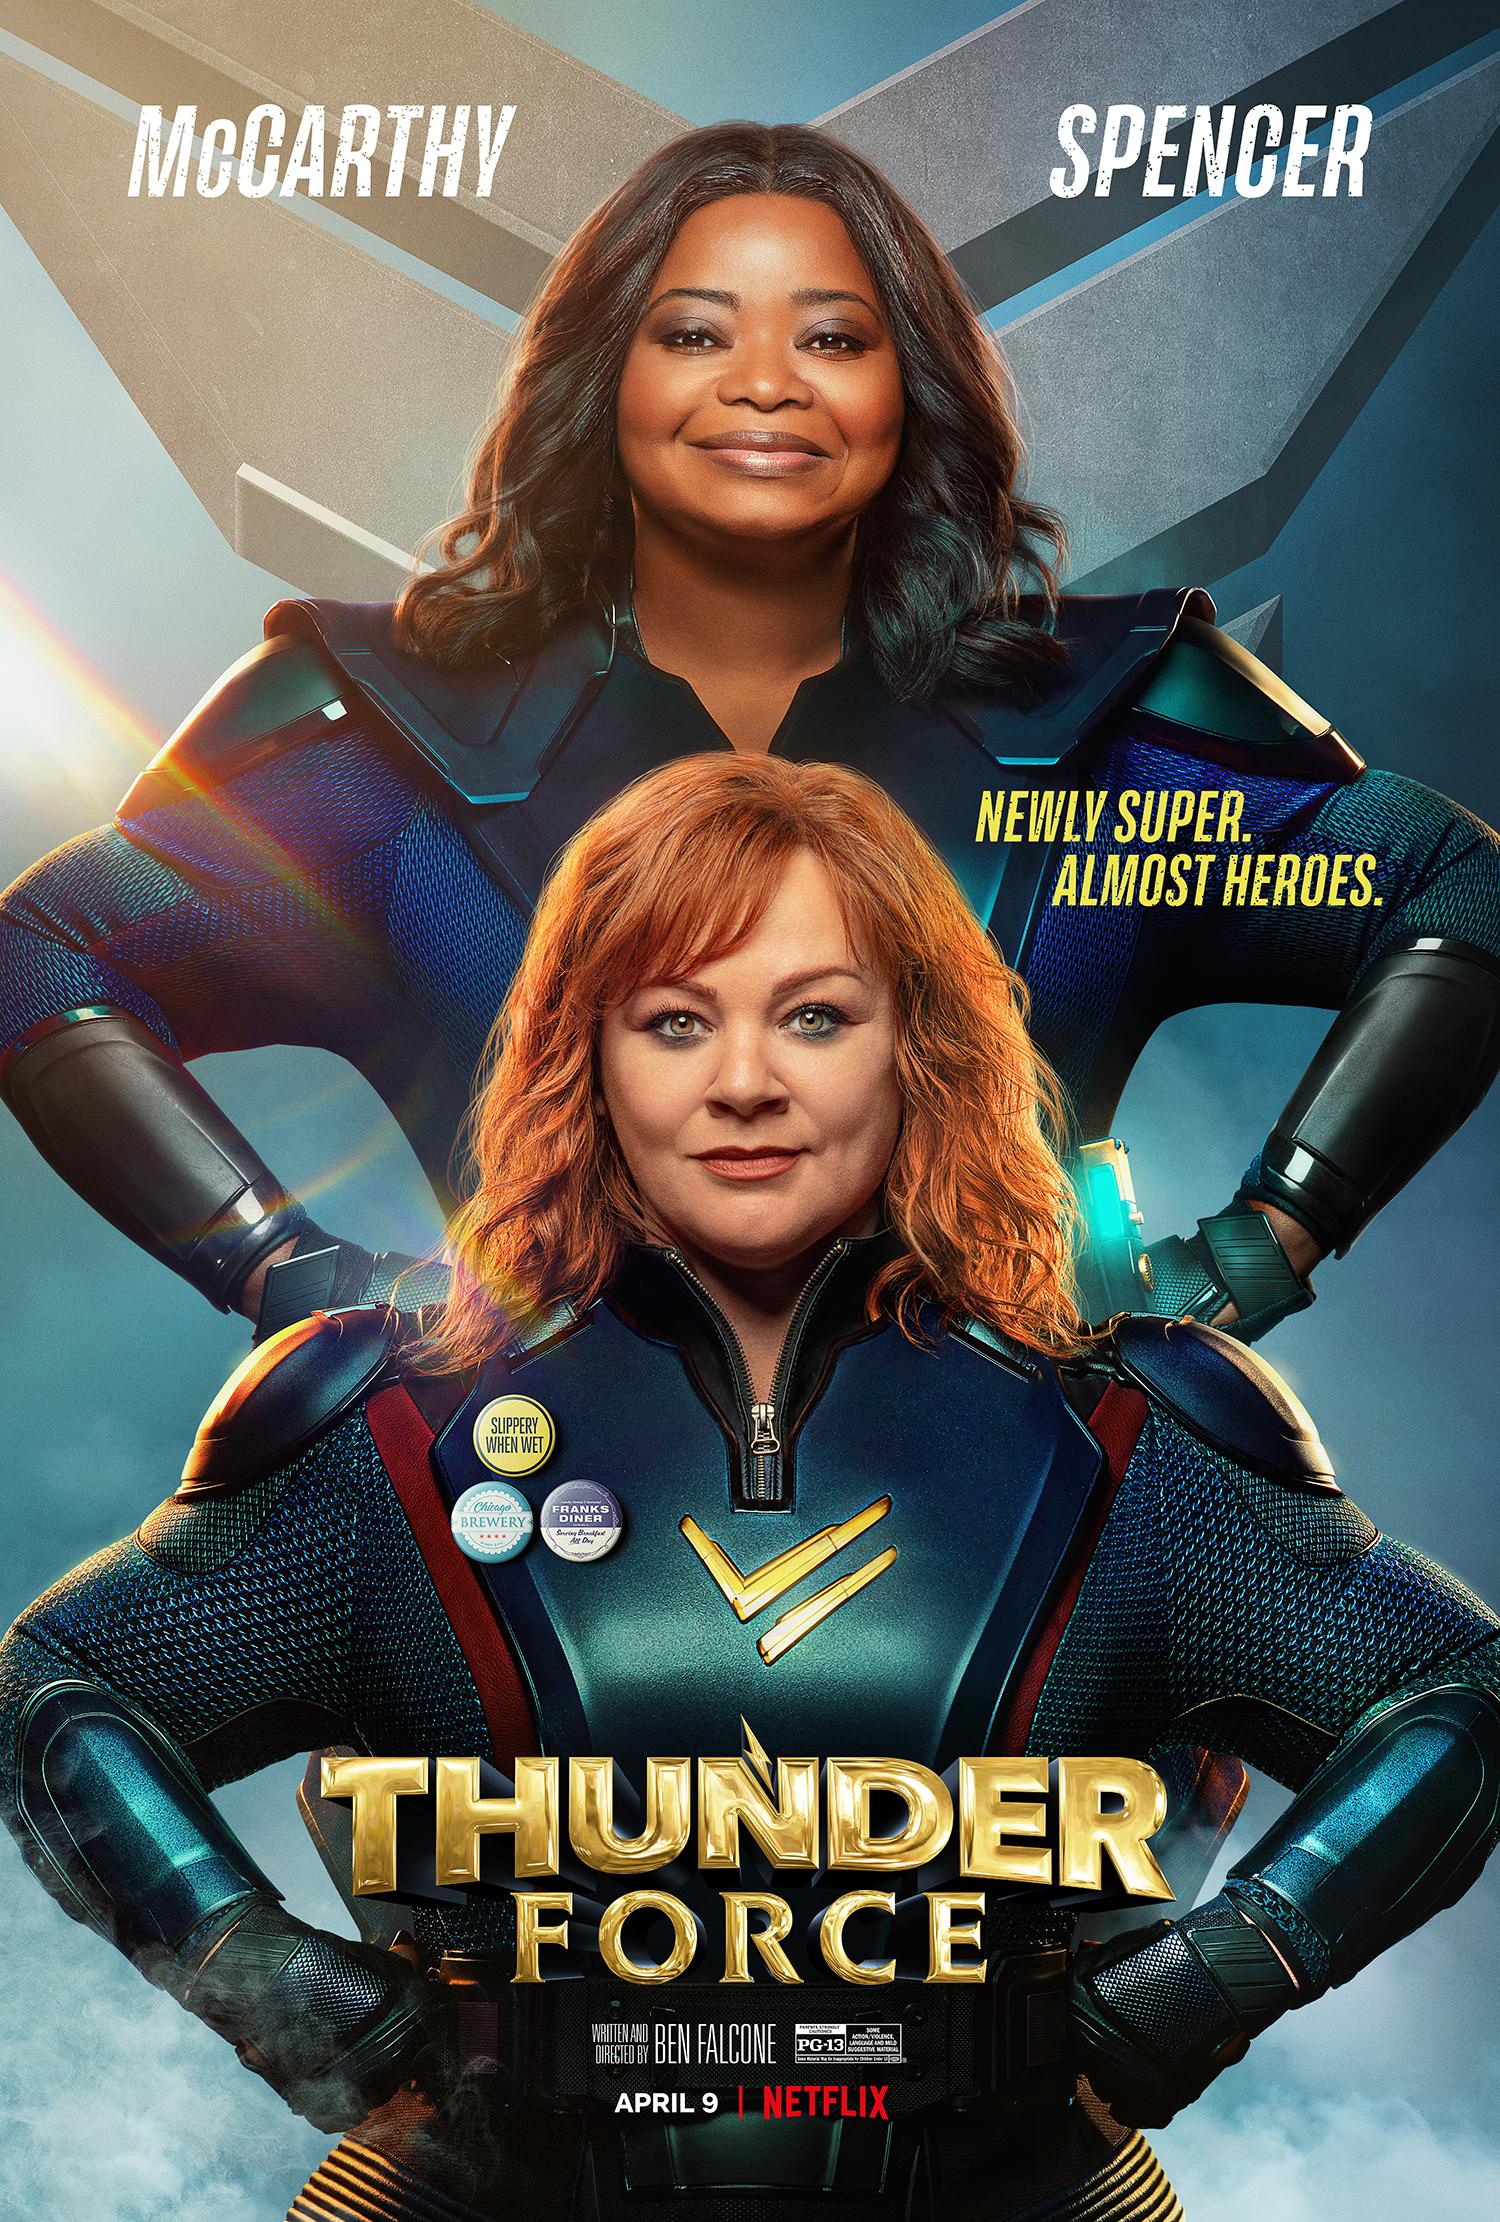 New Movie: Thunder Force Starring Octavia Spencer & Melissa McCarthy